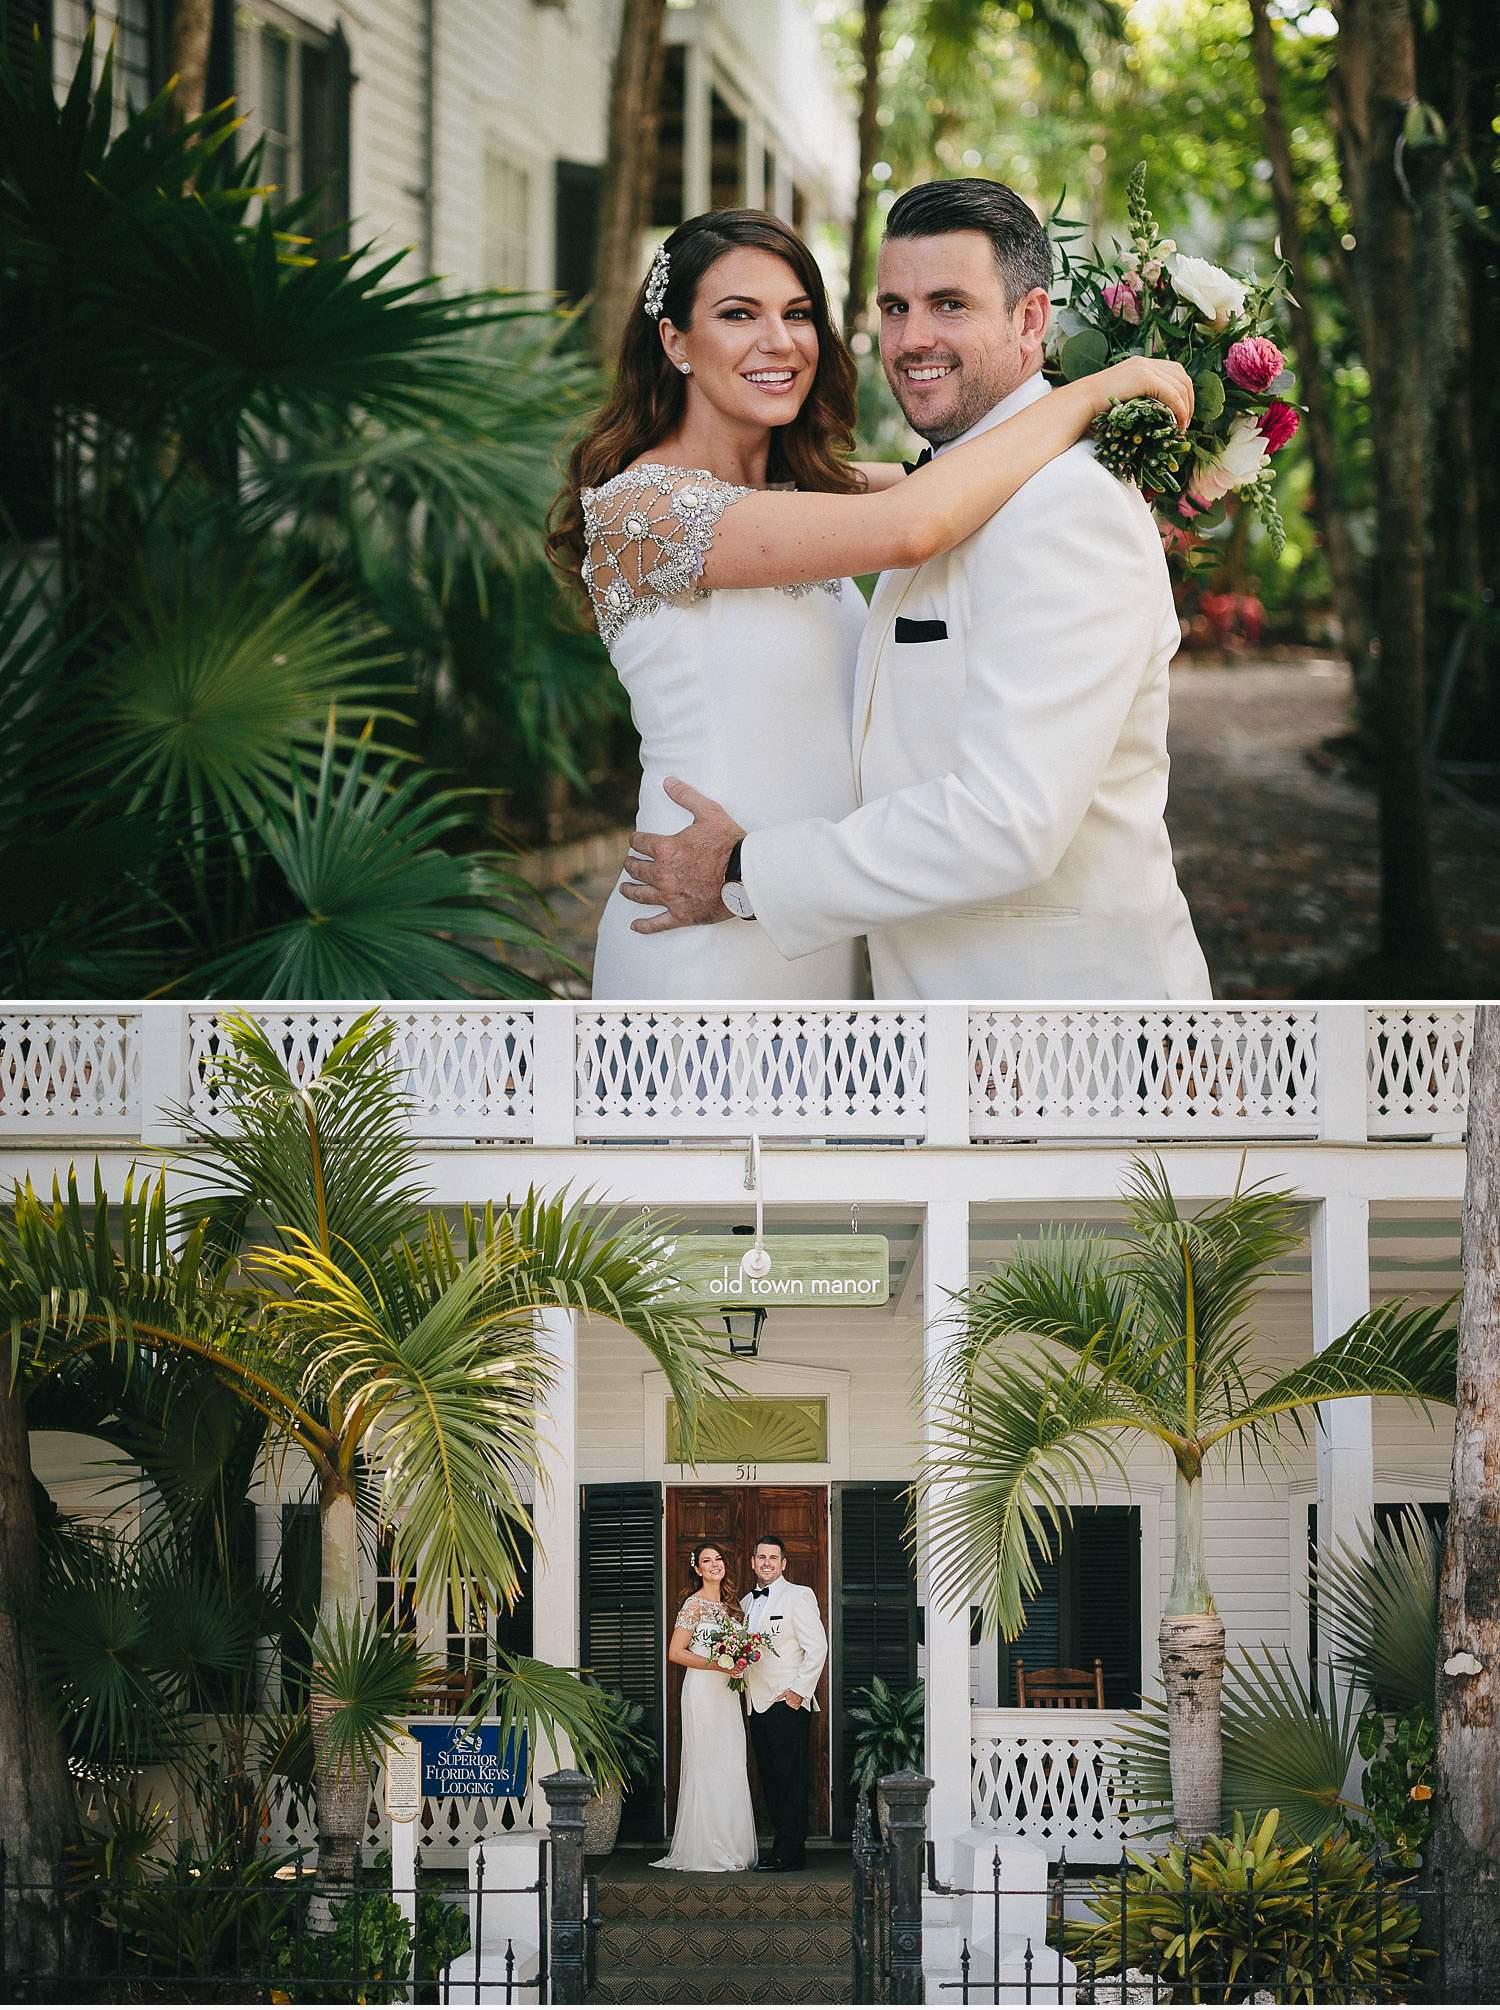 audubon-house-key-west-wedding-photographer-daniel-lateulade-0007.JPG